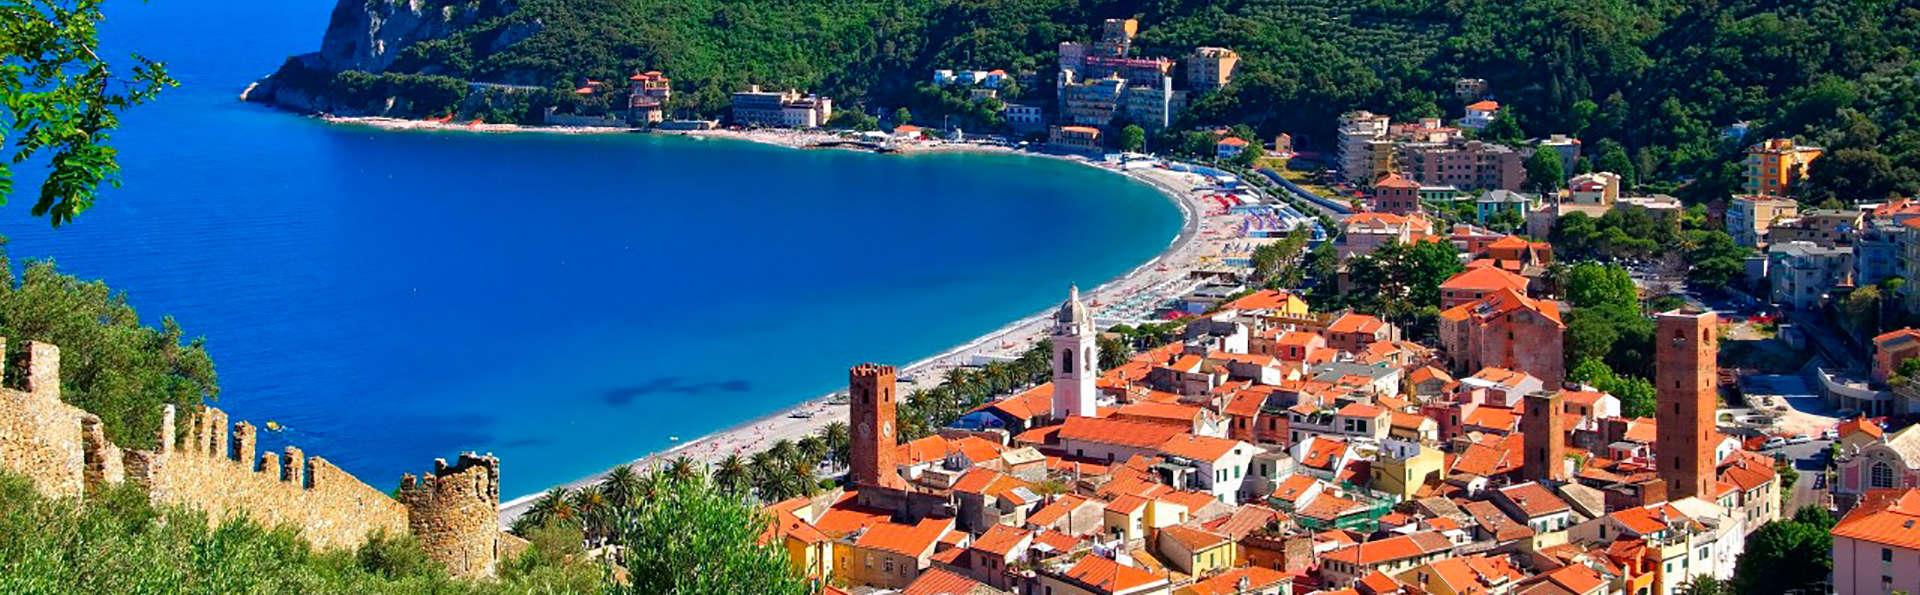 Ai Pozzi Village - edit_Noli-Liguria-Italy.jpg